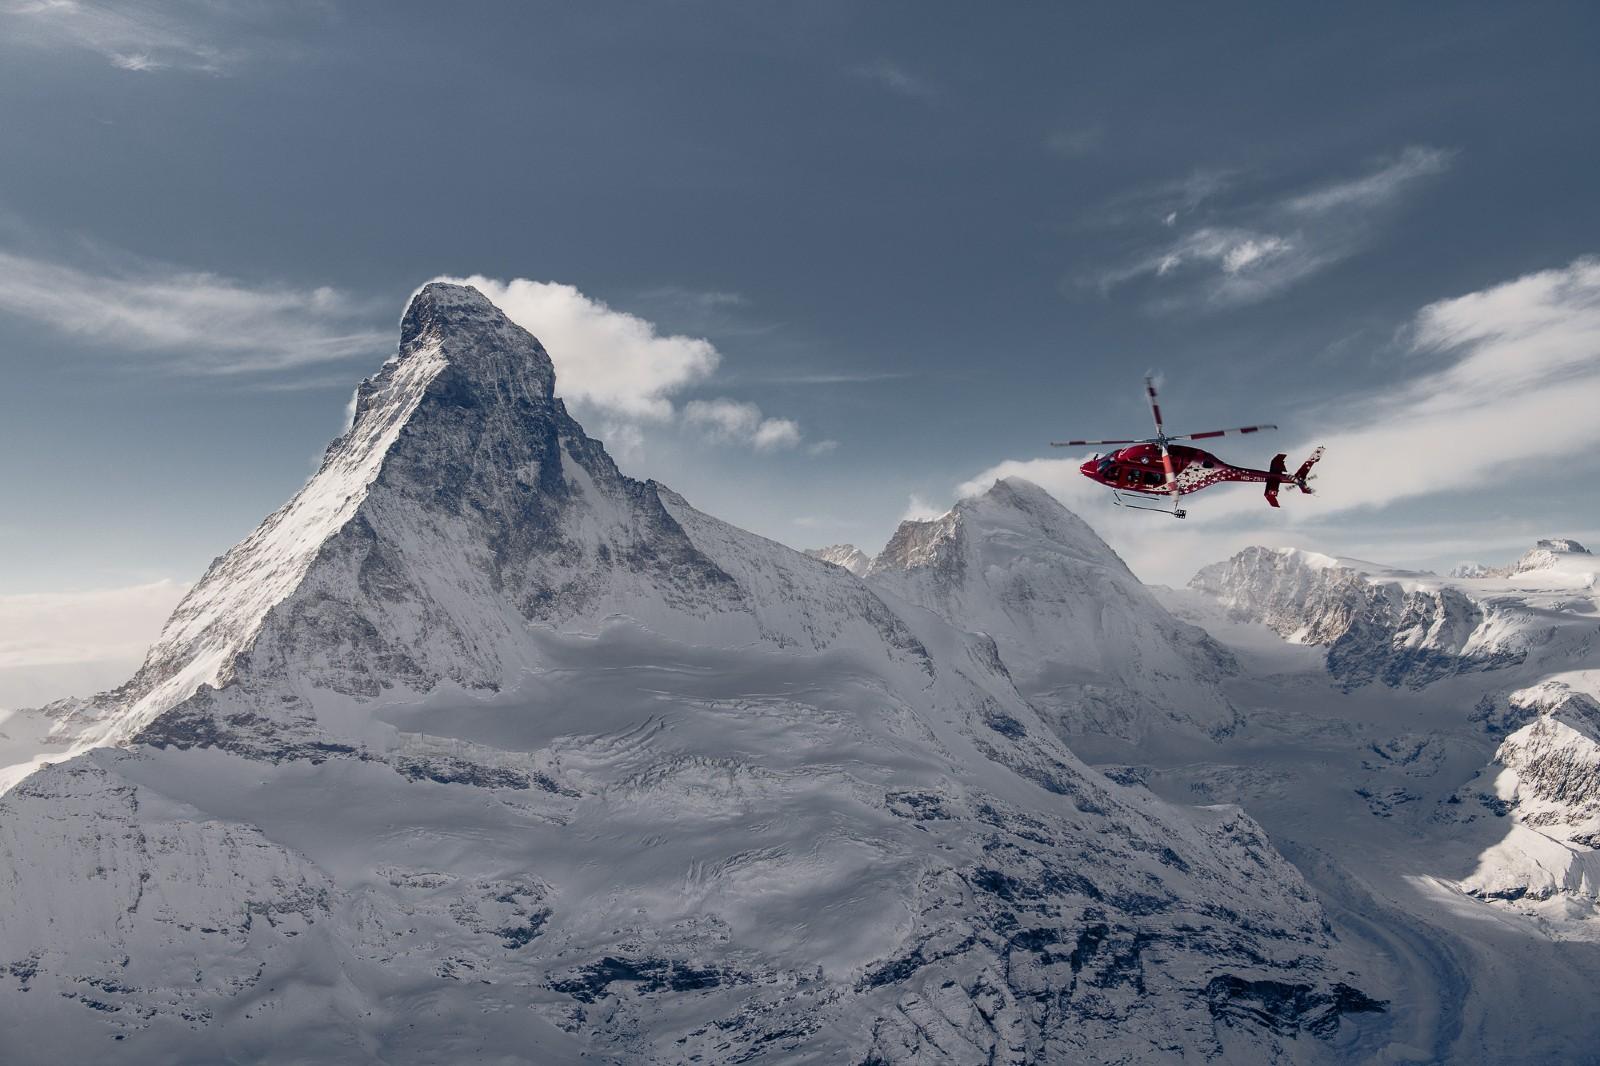 Hamilton Air Zermatt Image 1 10960